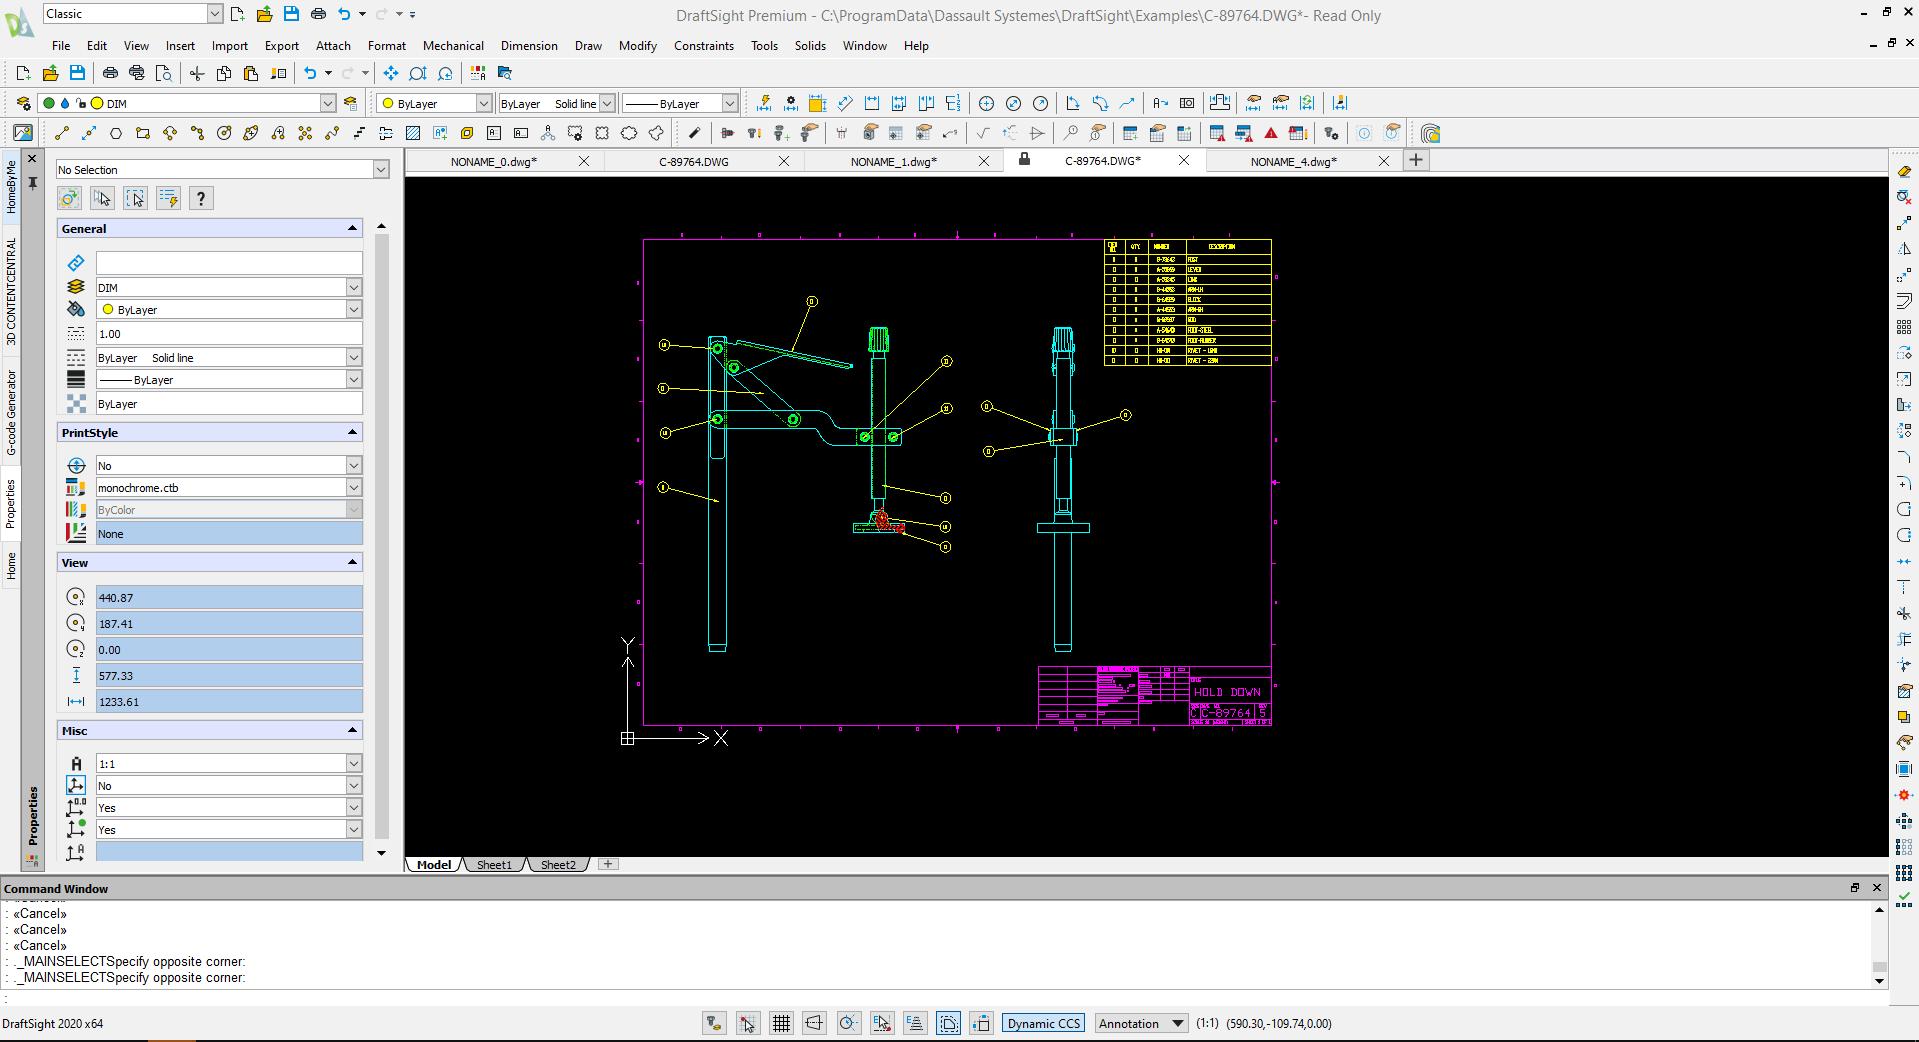 Introduction to DraftSight – 2 องค์ประกอบและหน้าตาของ DraftSight